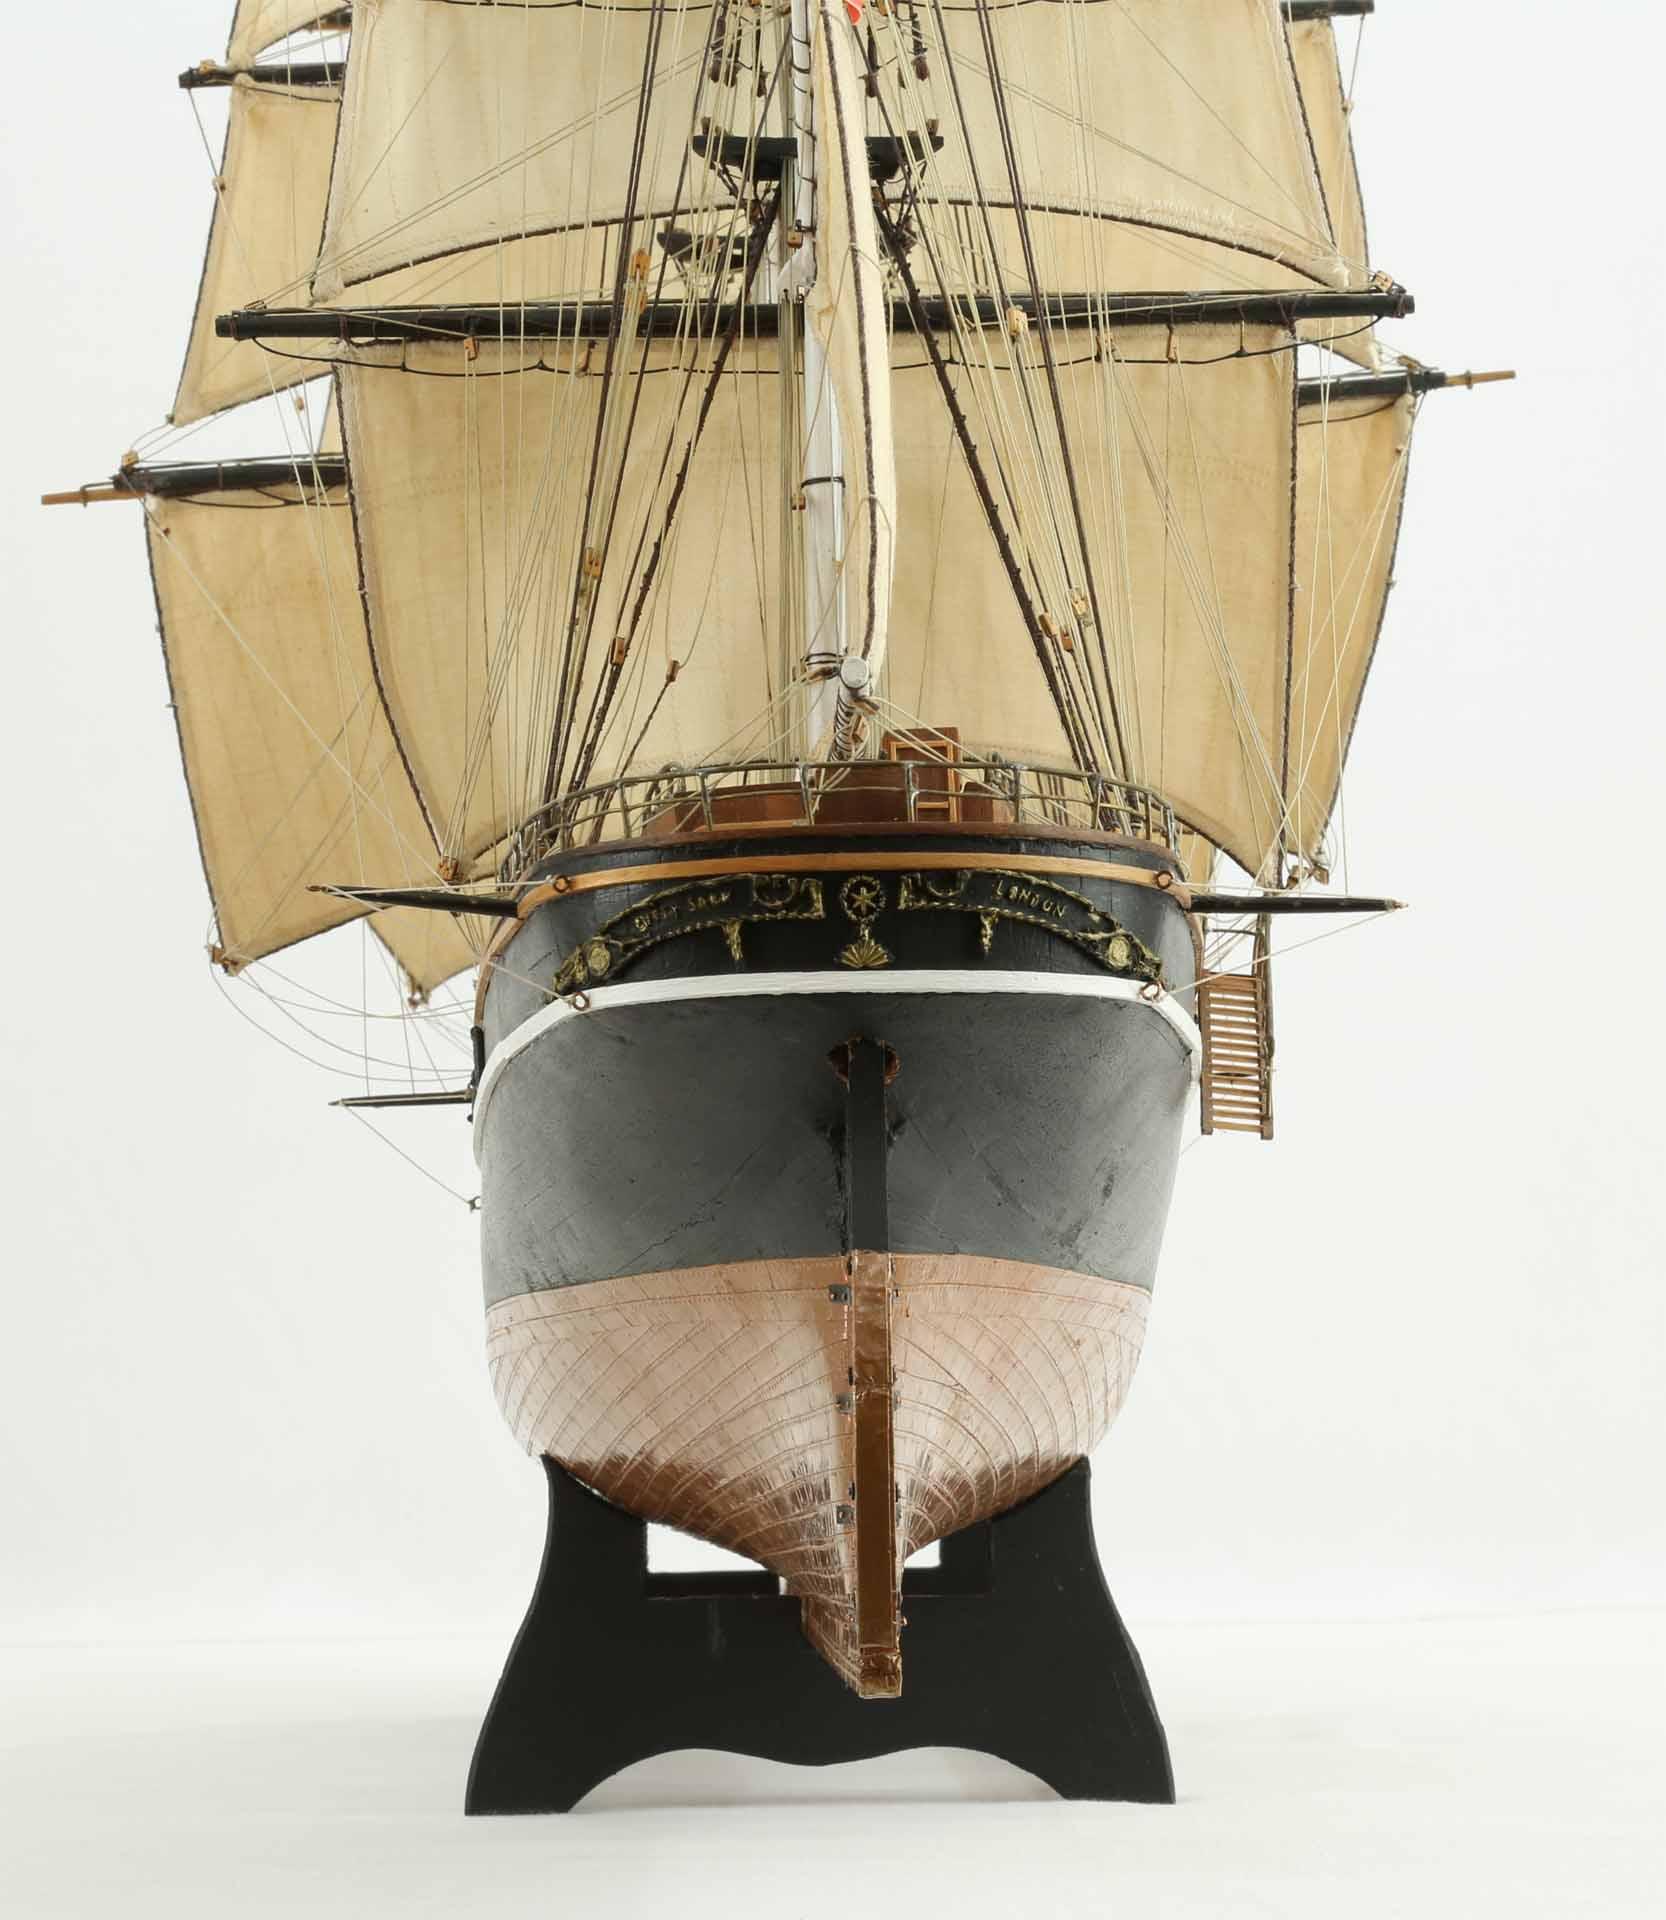 Photos ship model Cutty Sark, views of details